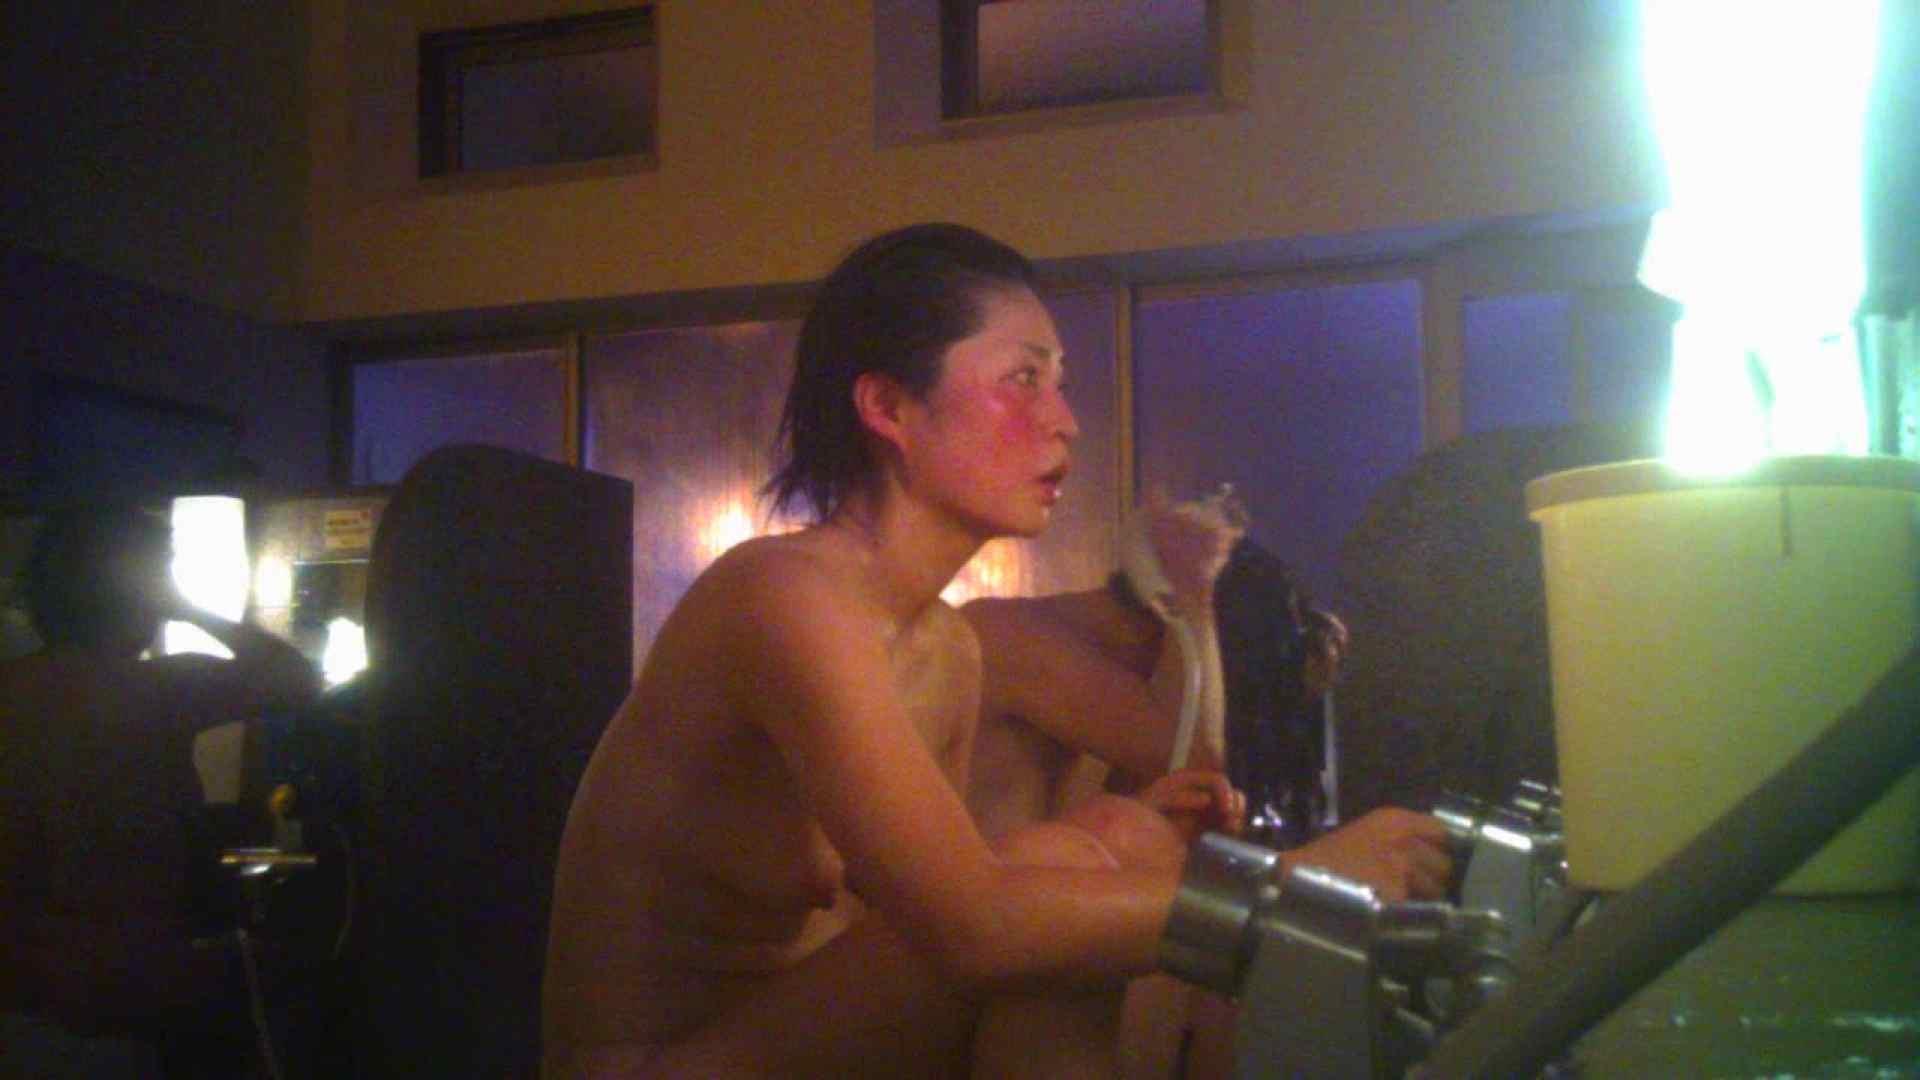 TG.21 【上等兵】井戸端会議が大好きな奥さん 潜入エロ調査   女風呂ハメ撮り  51連発 39